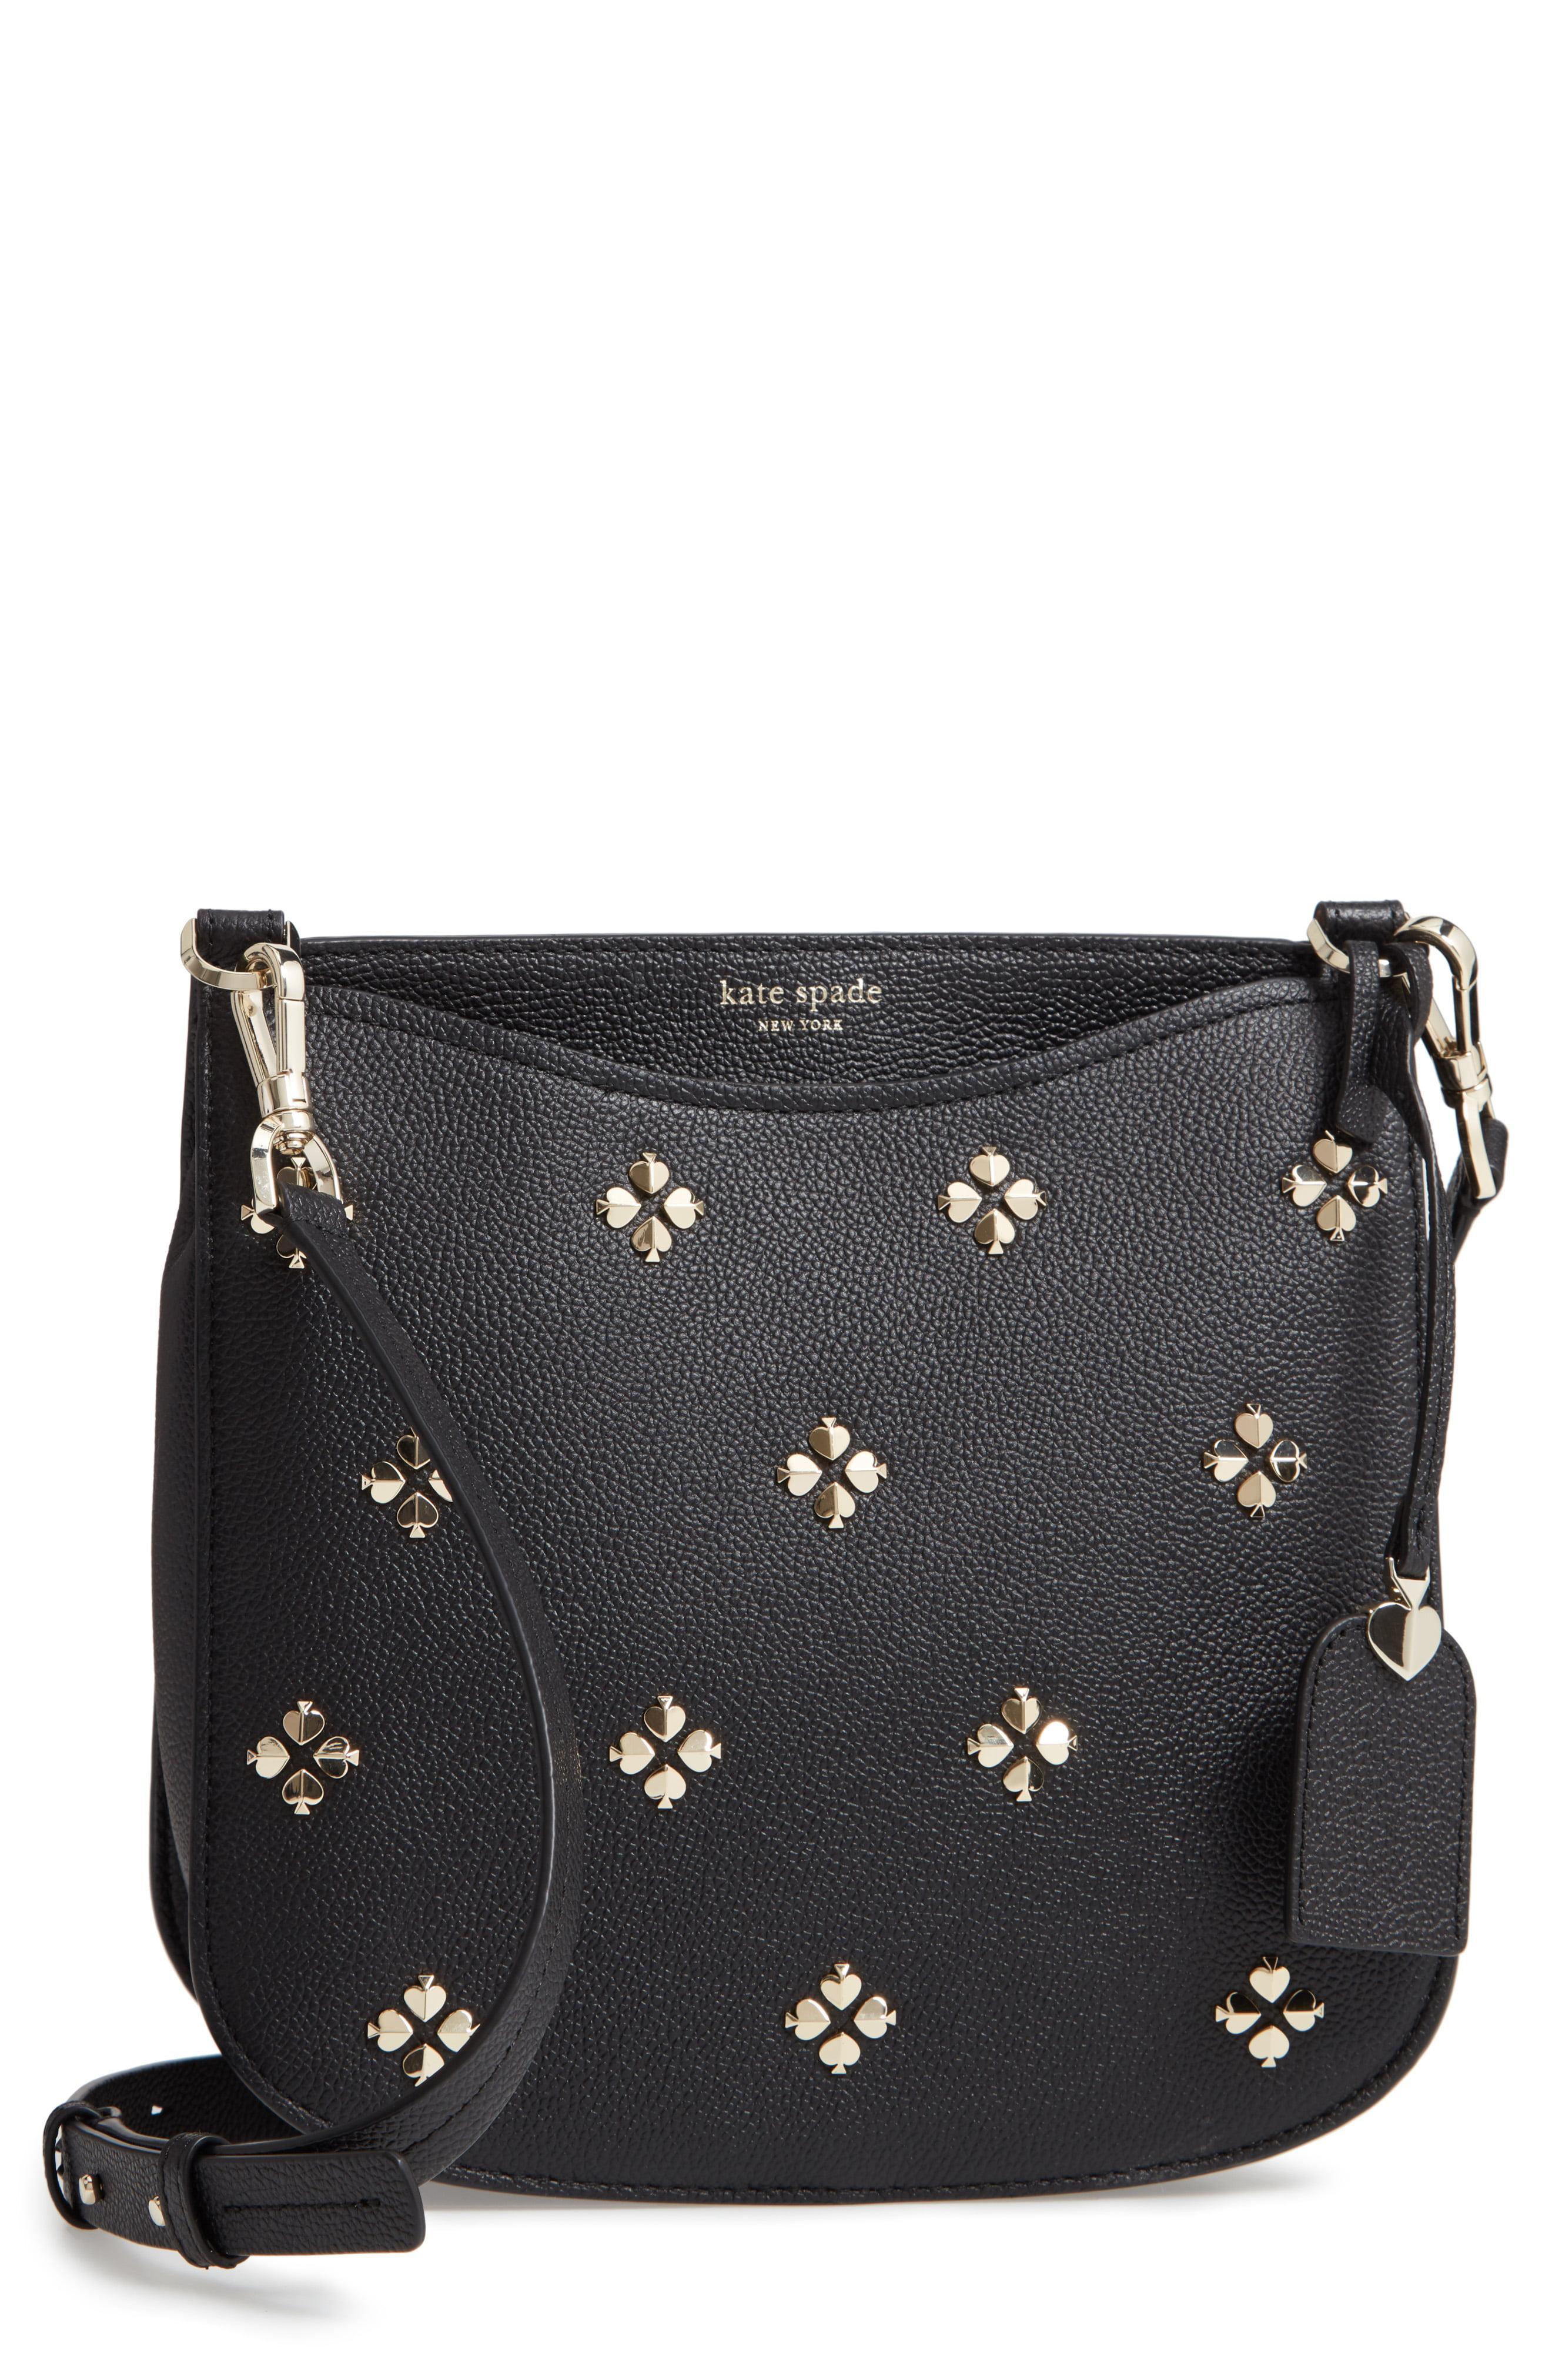 4c221a7b3 Kate Spade. Women's Black Large Margaux Embellished Leather Crossbody Bag -